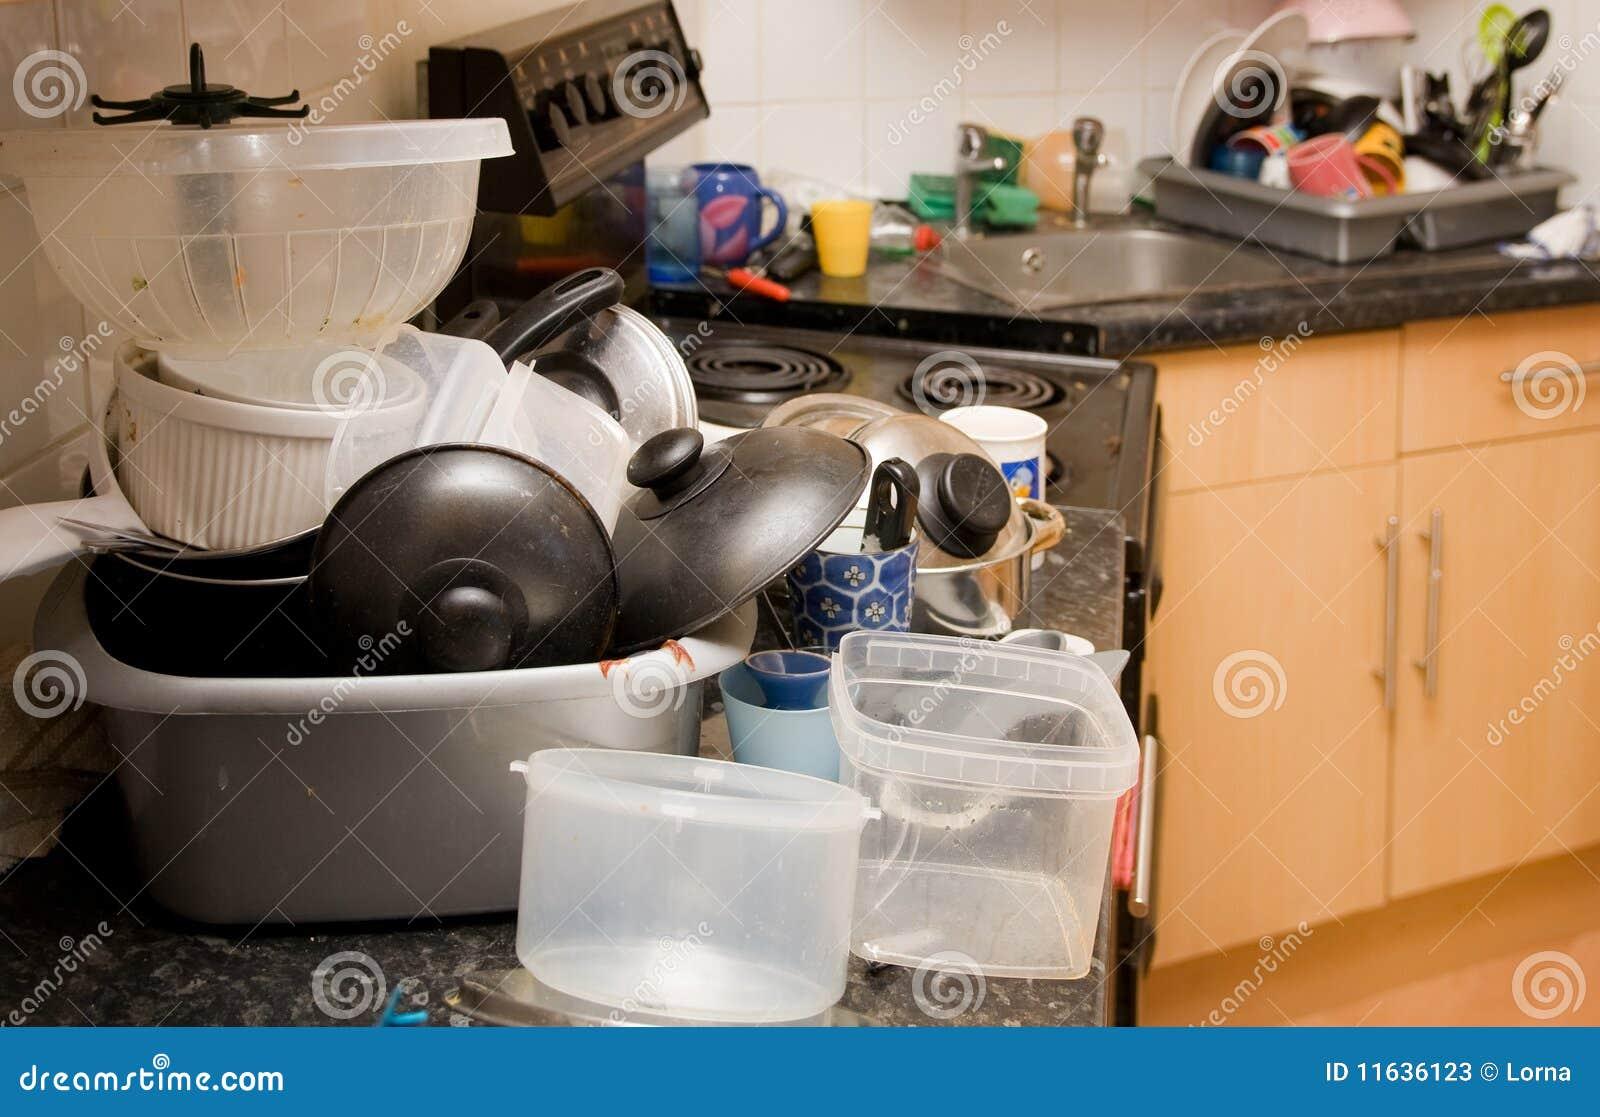 Kitchen Dirty Mess Washing Up Stock Photos Image 11636123